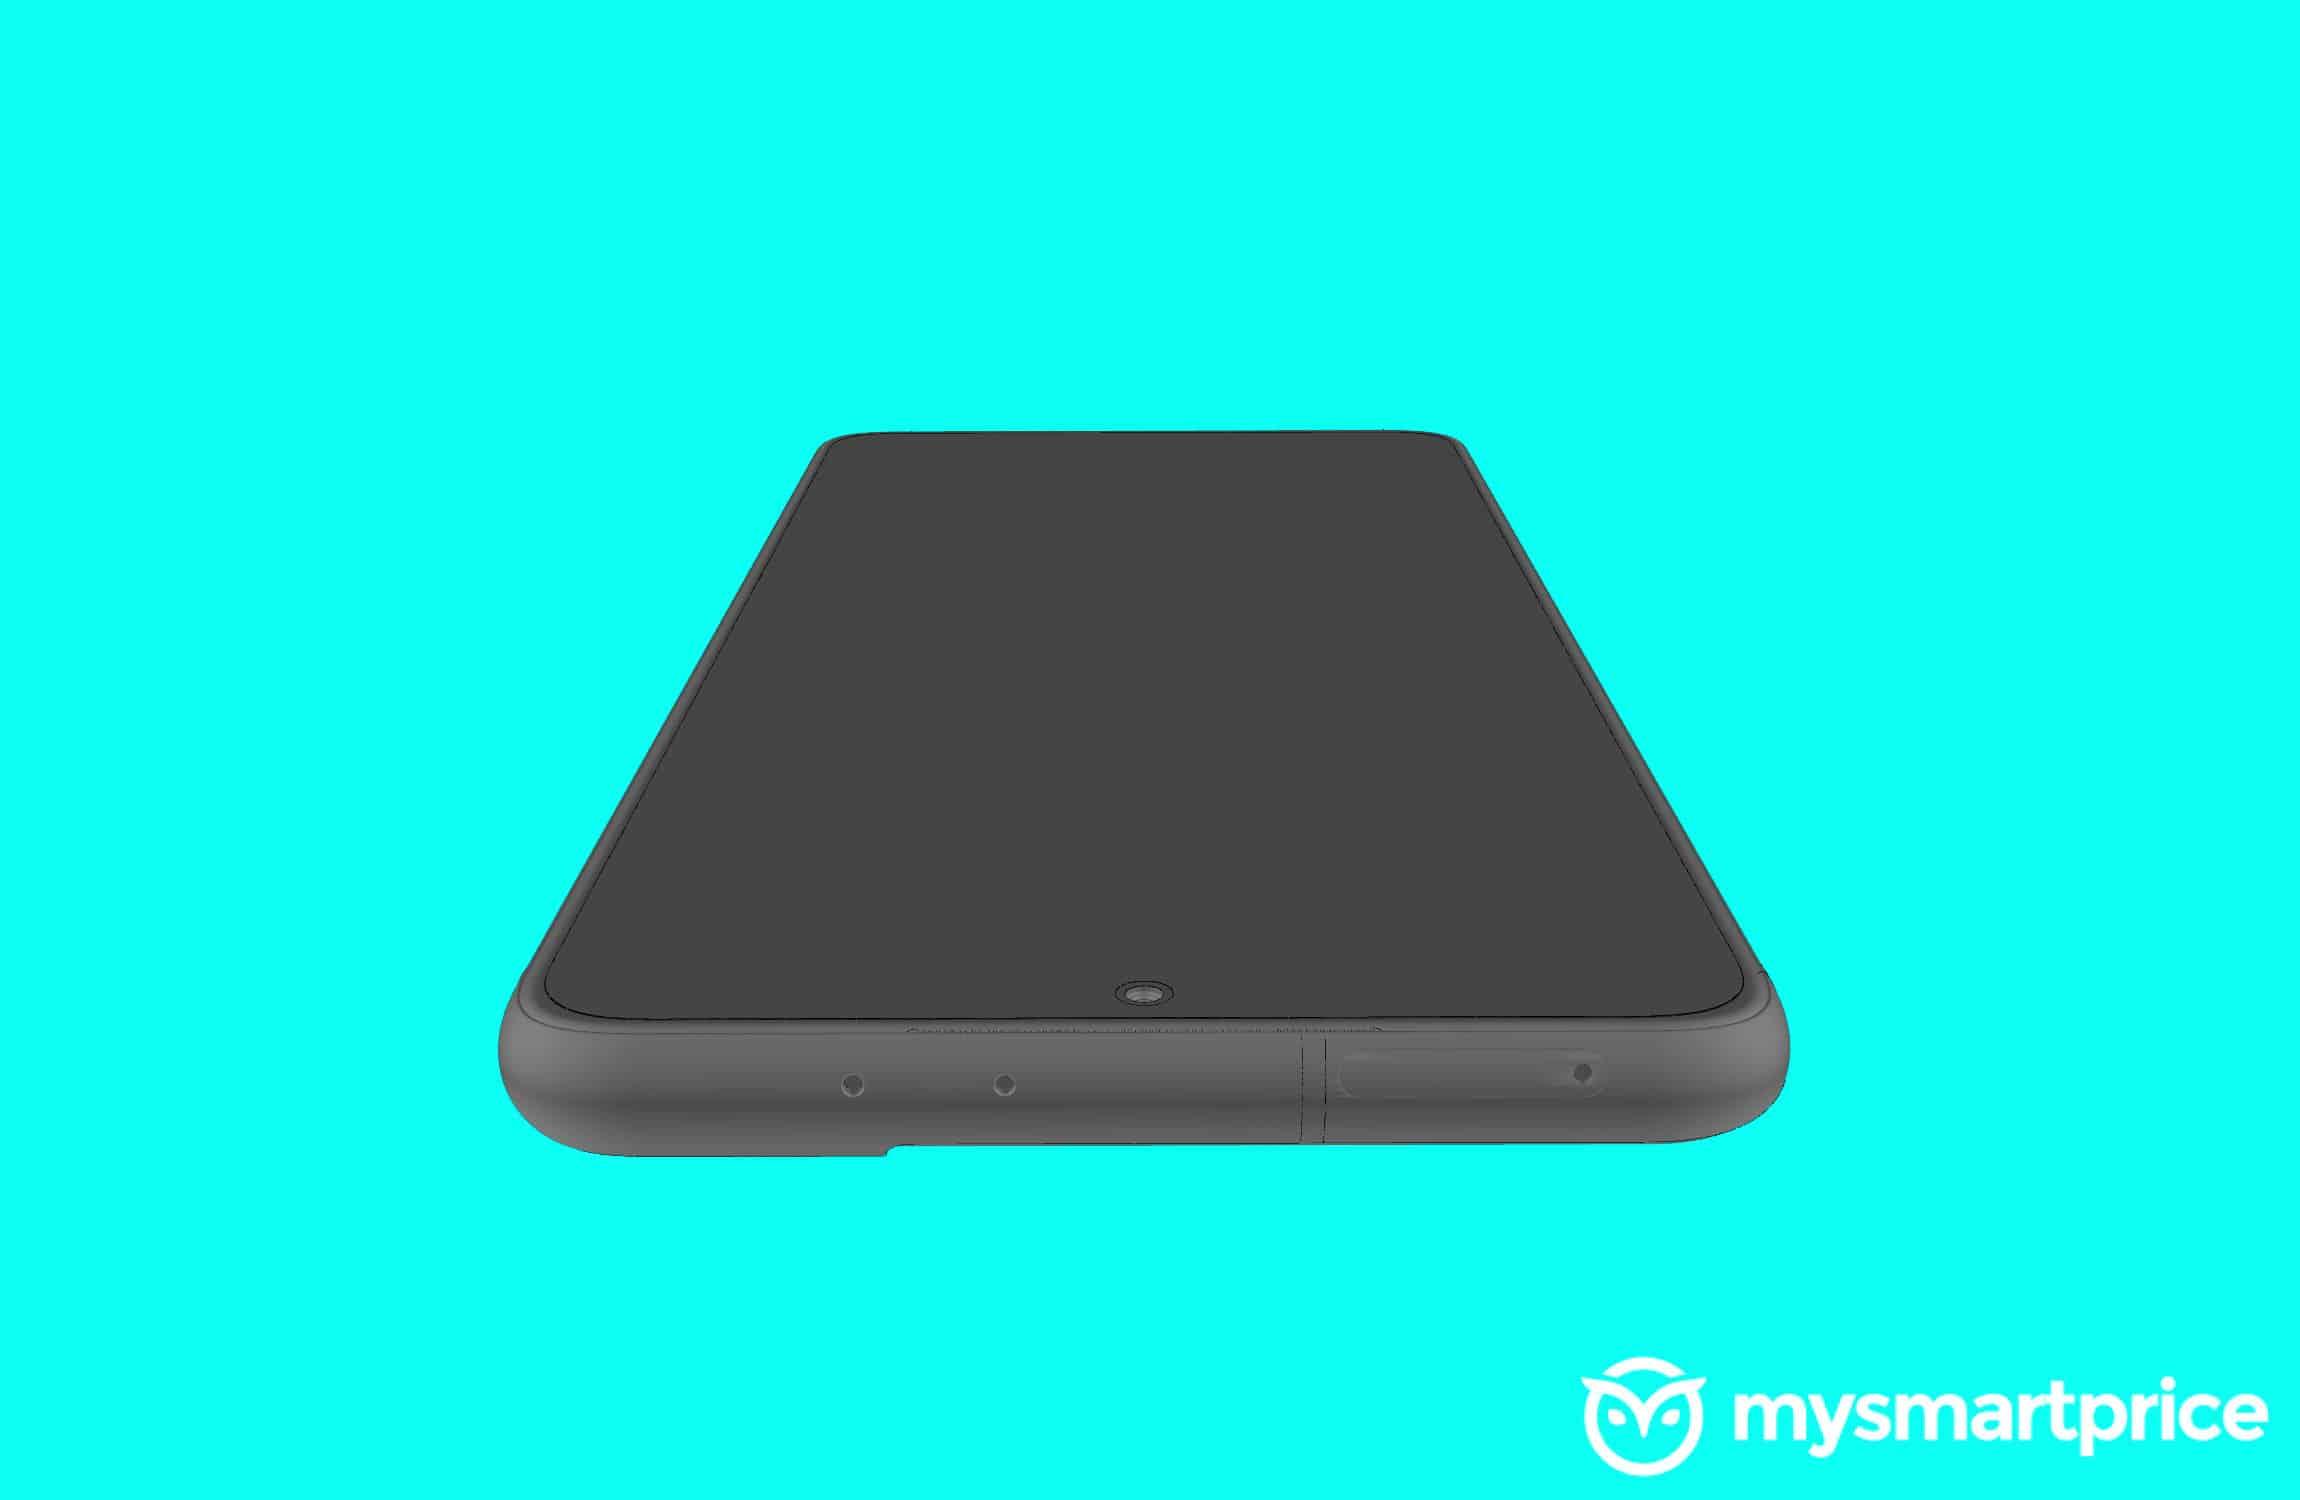 Samsung Galaxy 21 image render leak 6